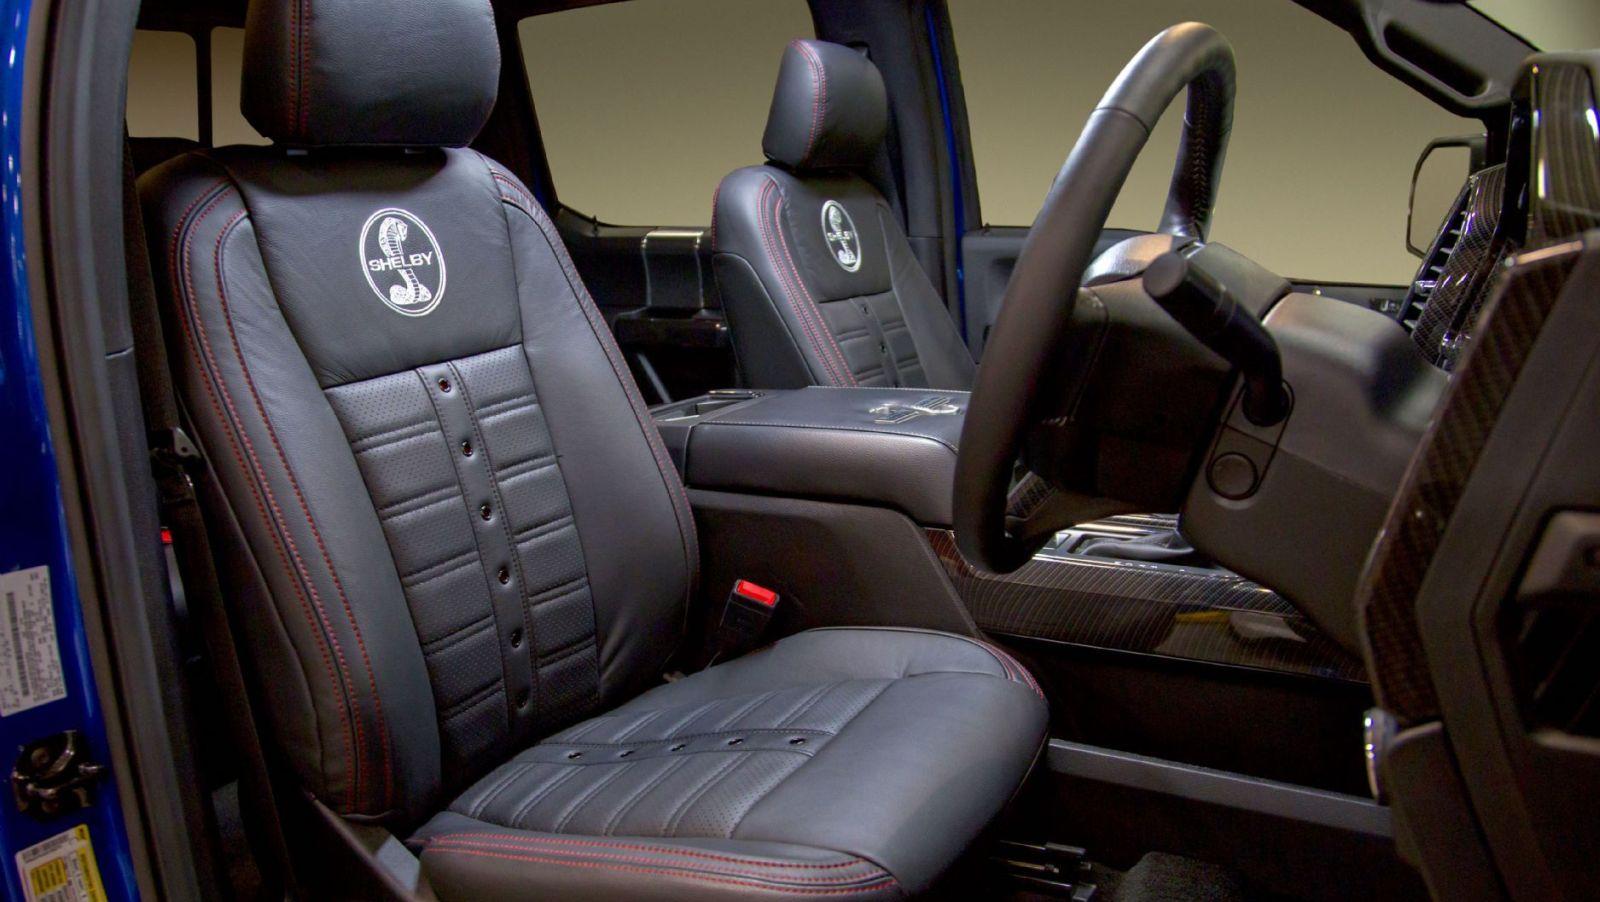 cars,ford,shelby,f150,raptor,baja,bakkie,truck,new car,south africa,sxdrv,bds,